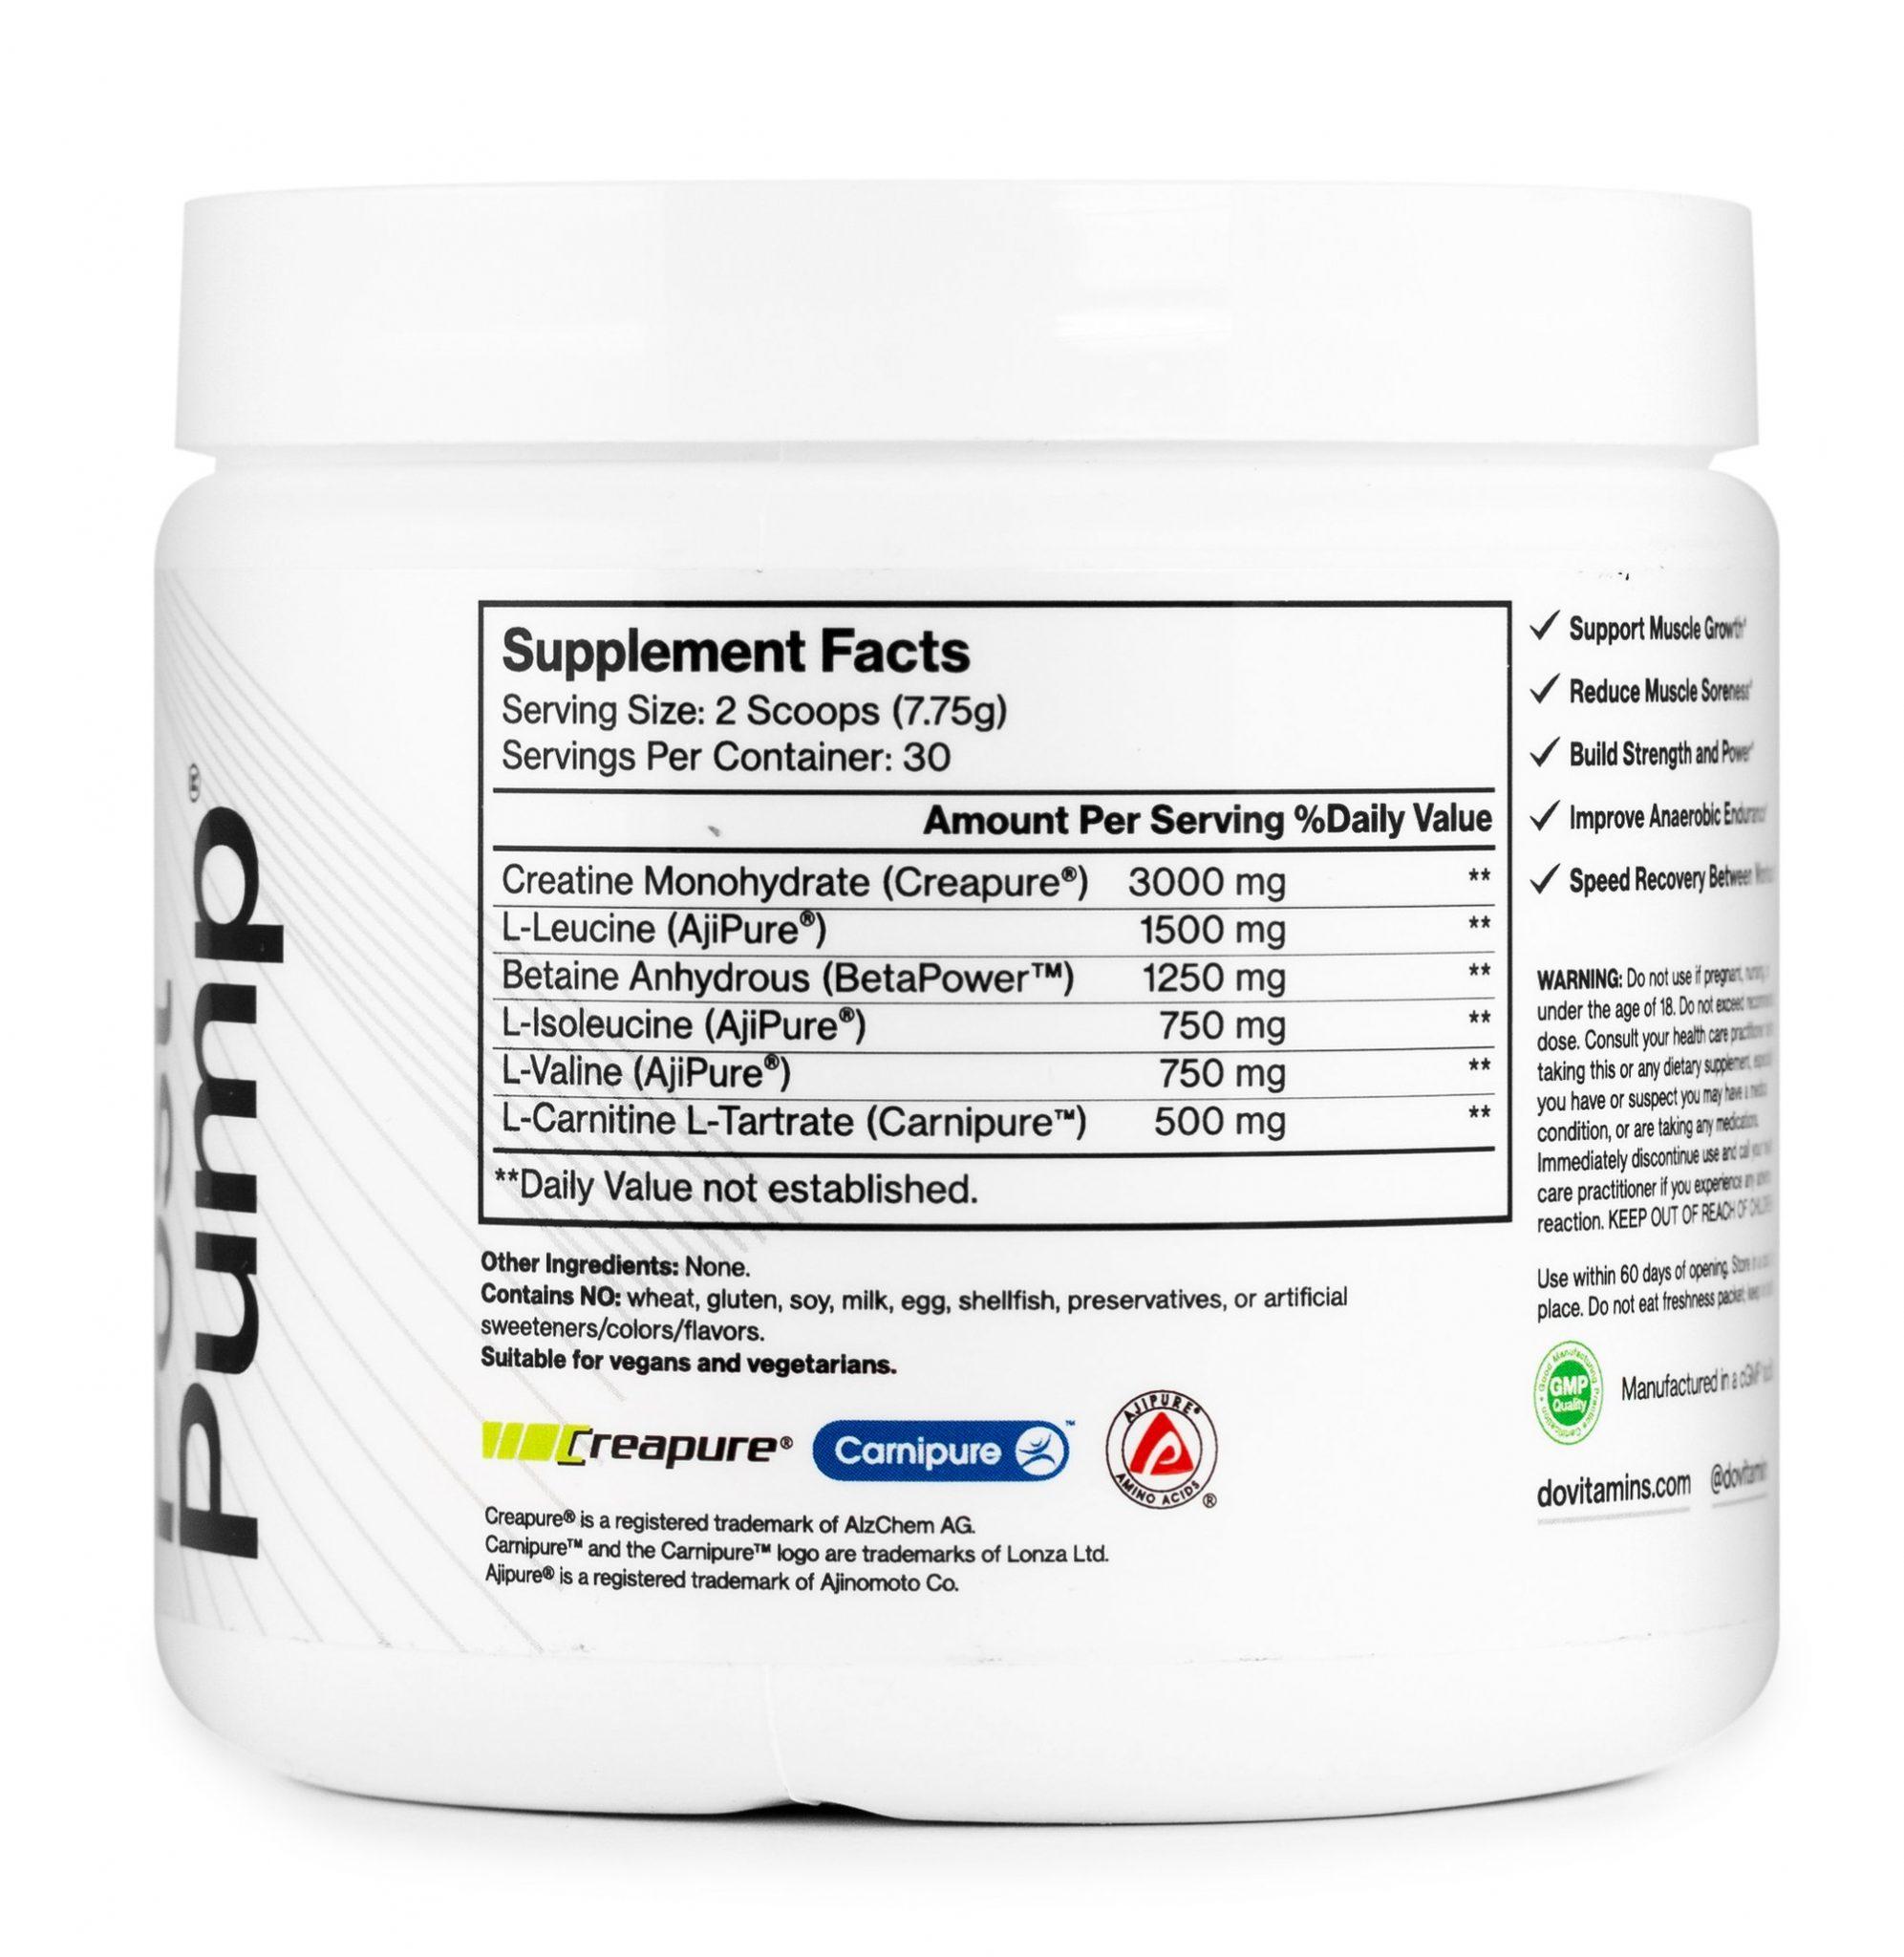 PostPump NFP - Do Vitamins - Certified Paleo, Keto Certified, Paleo Friendly, PaleoVegan by the Paleo Foundation